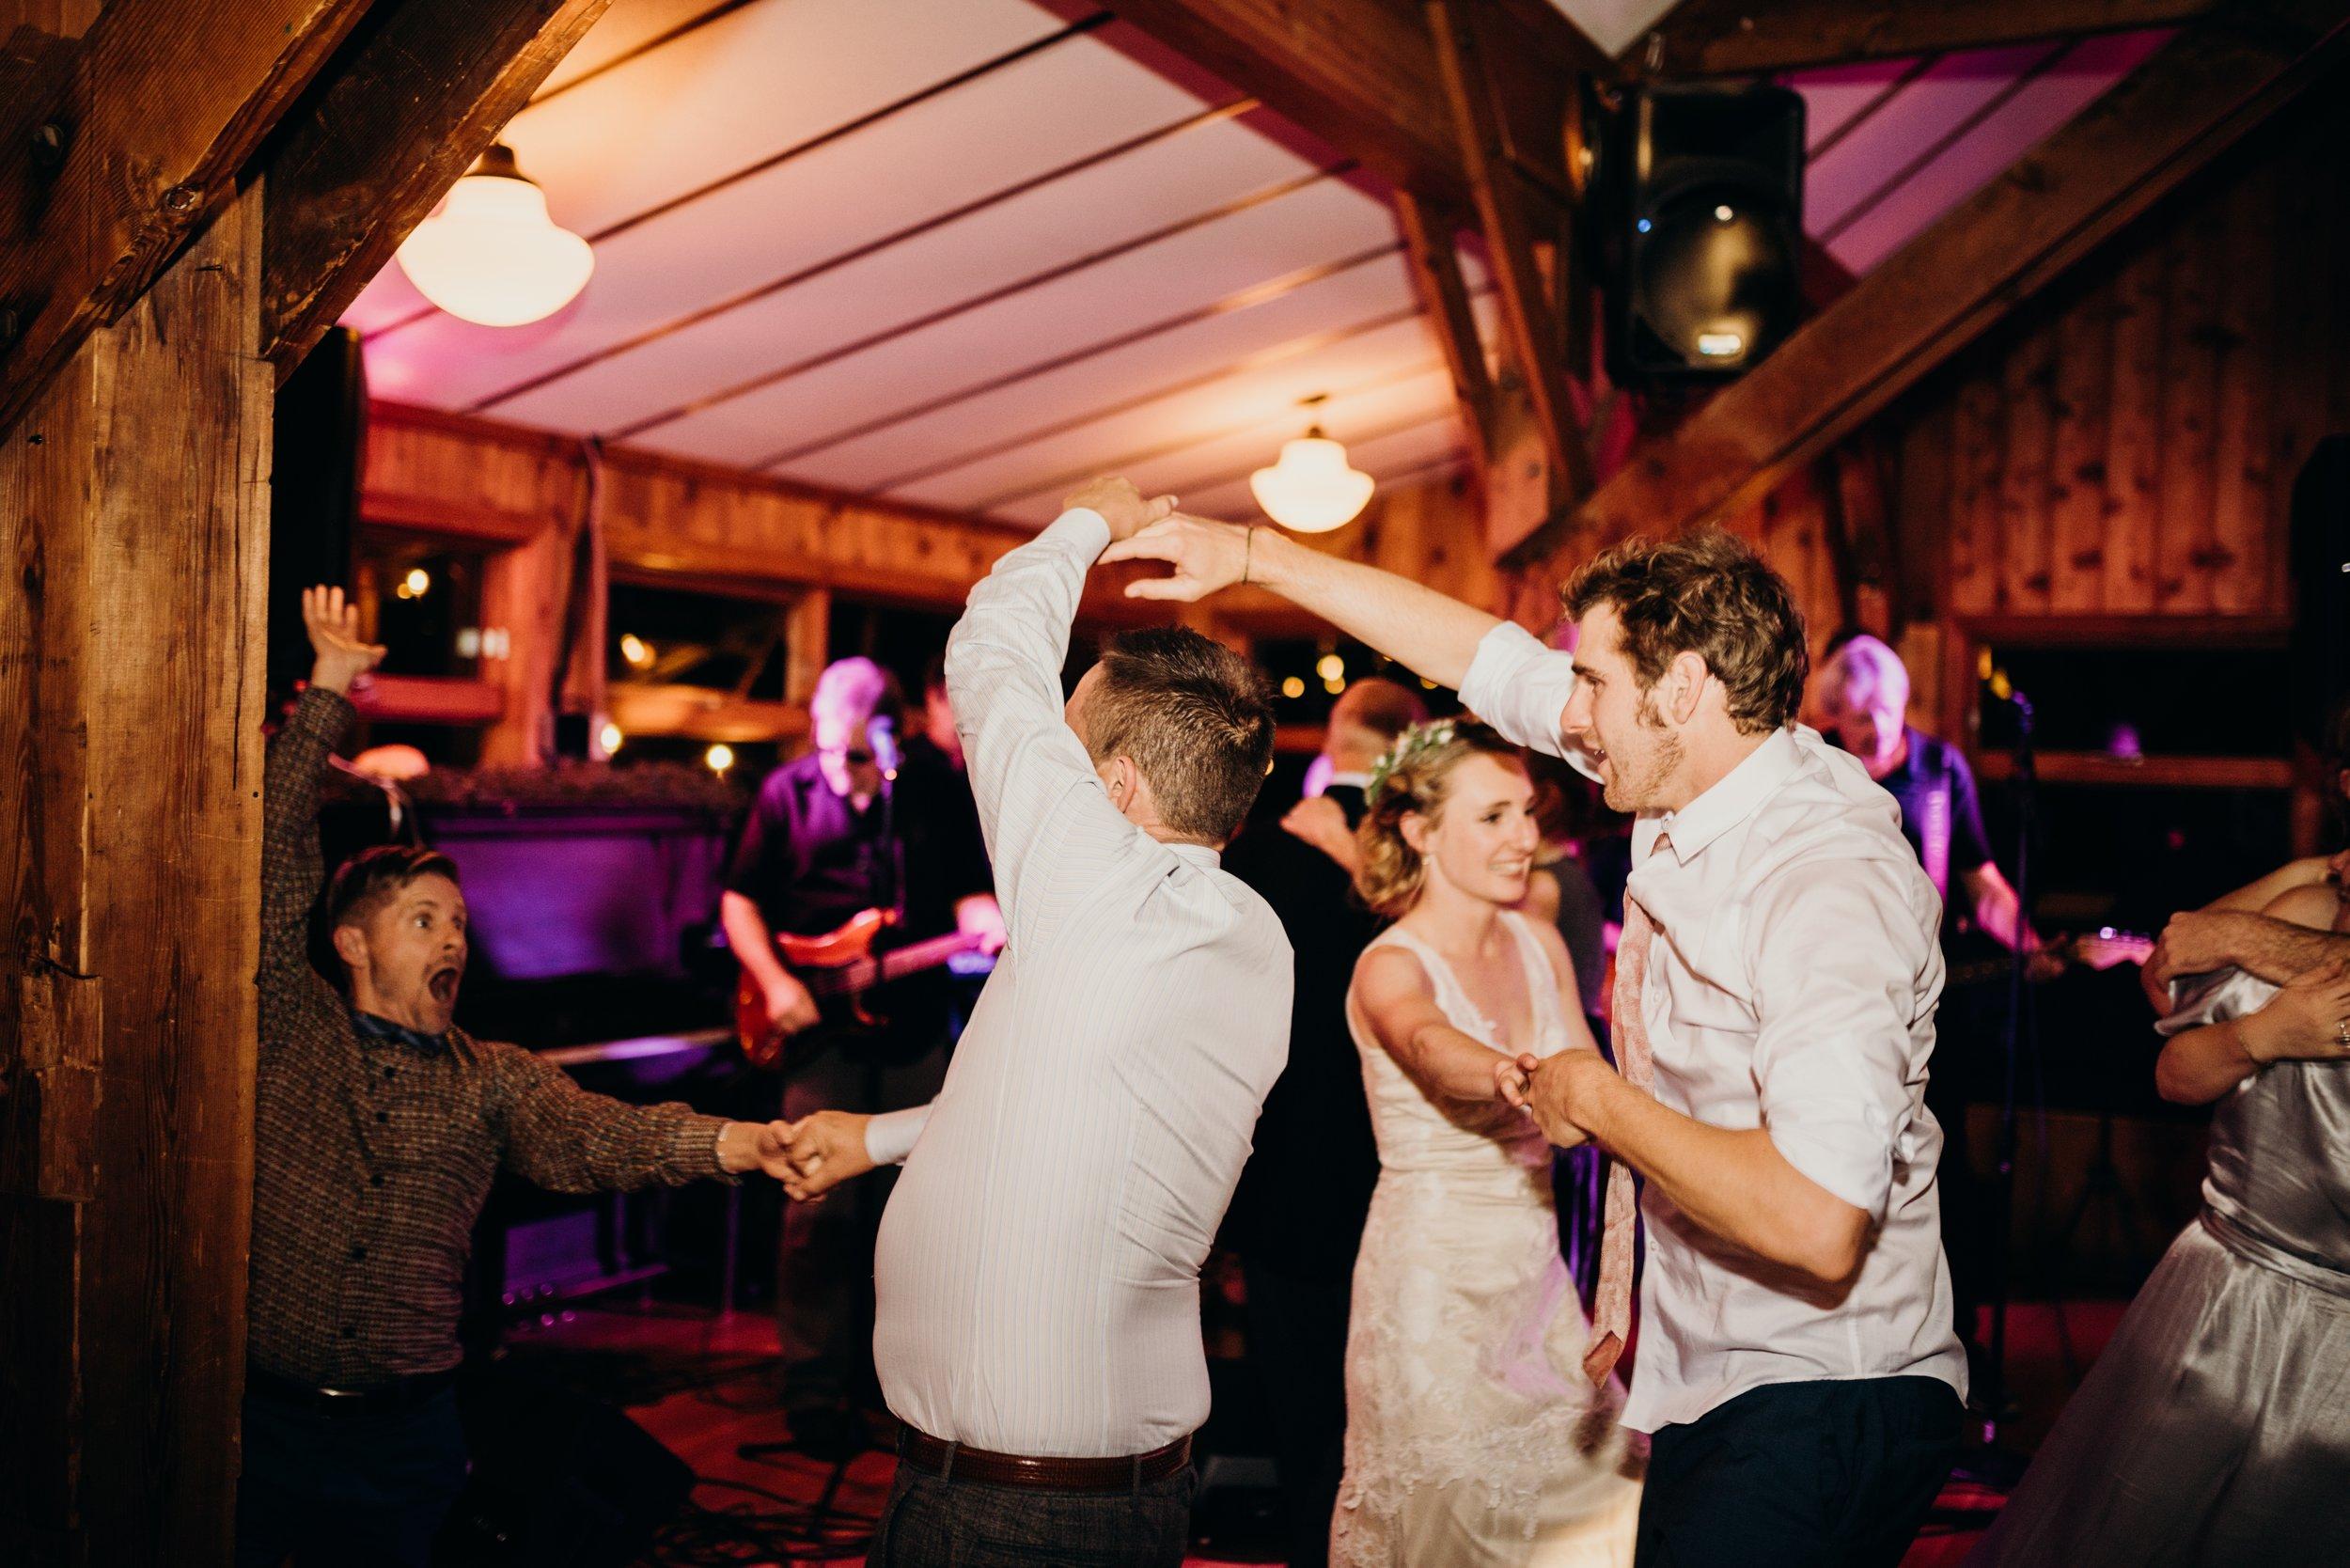 10 Dancing-38.jpeg